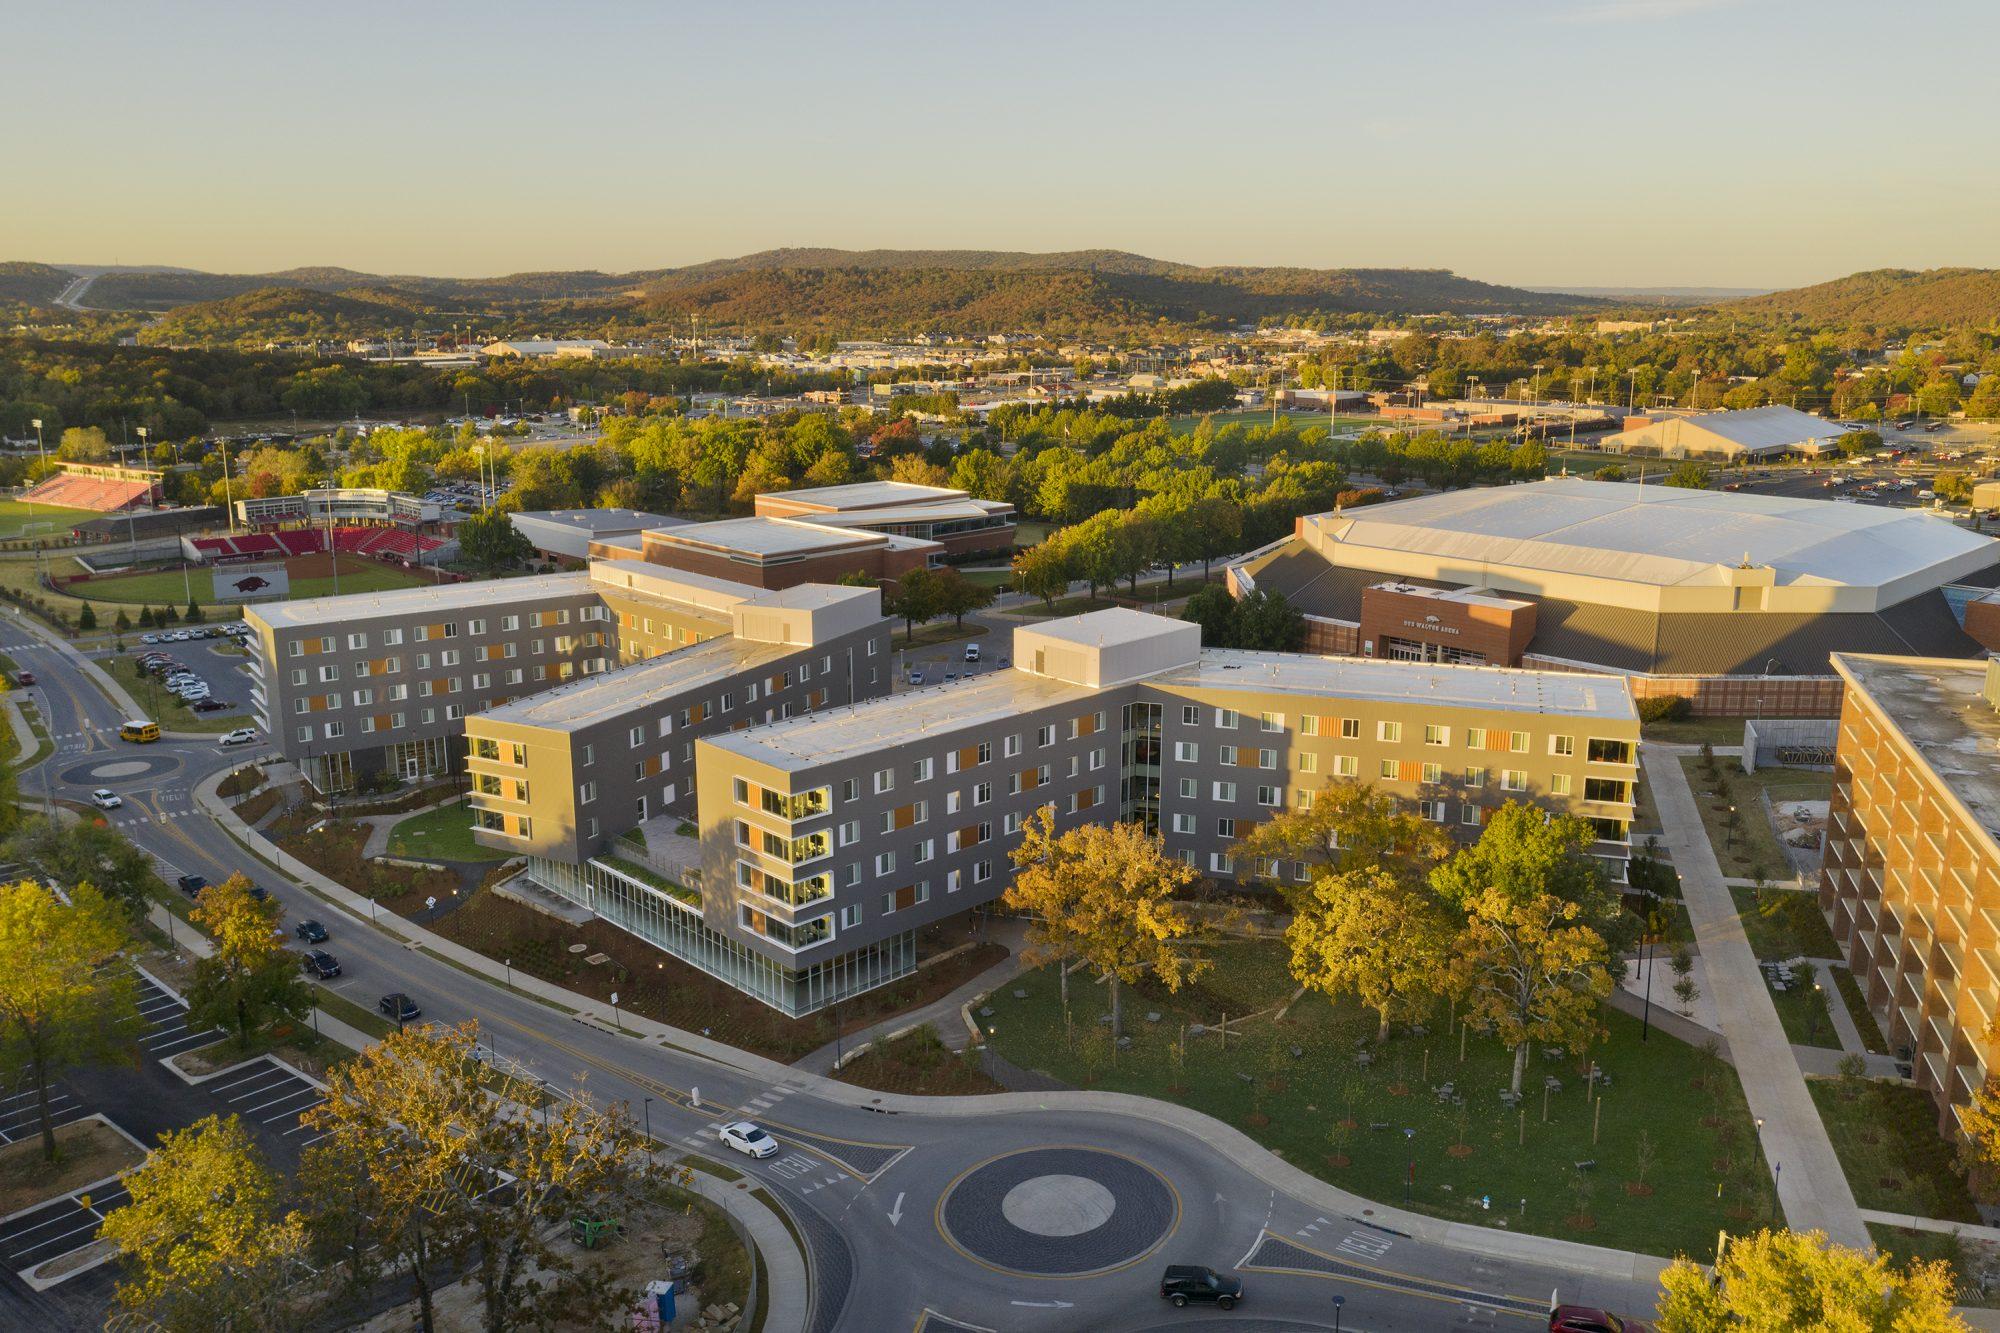 University of Arkansas Adohi Hall